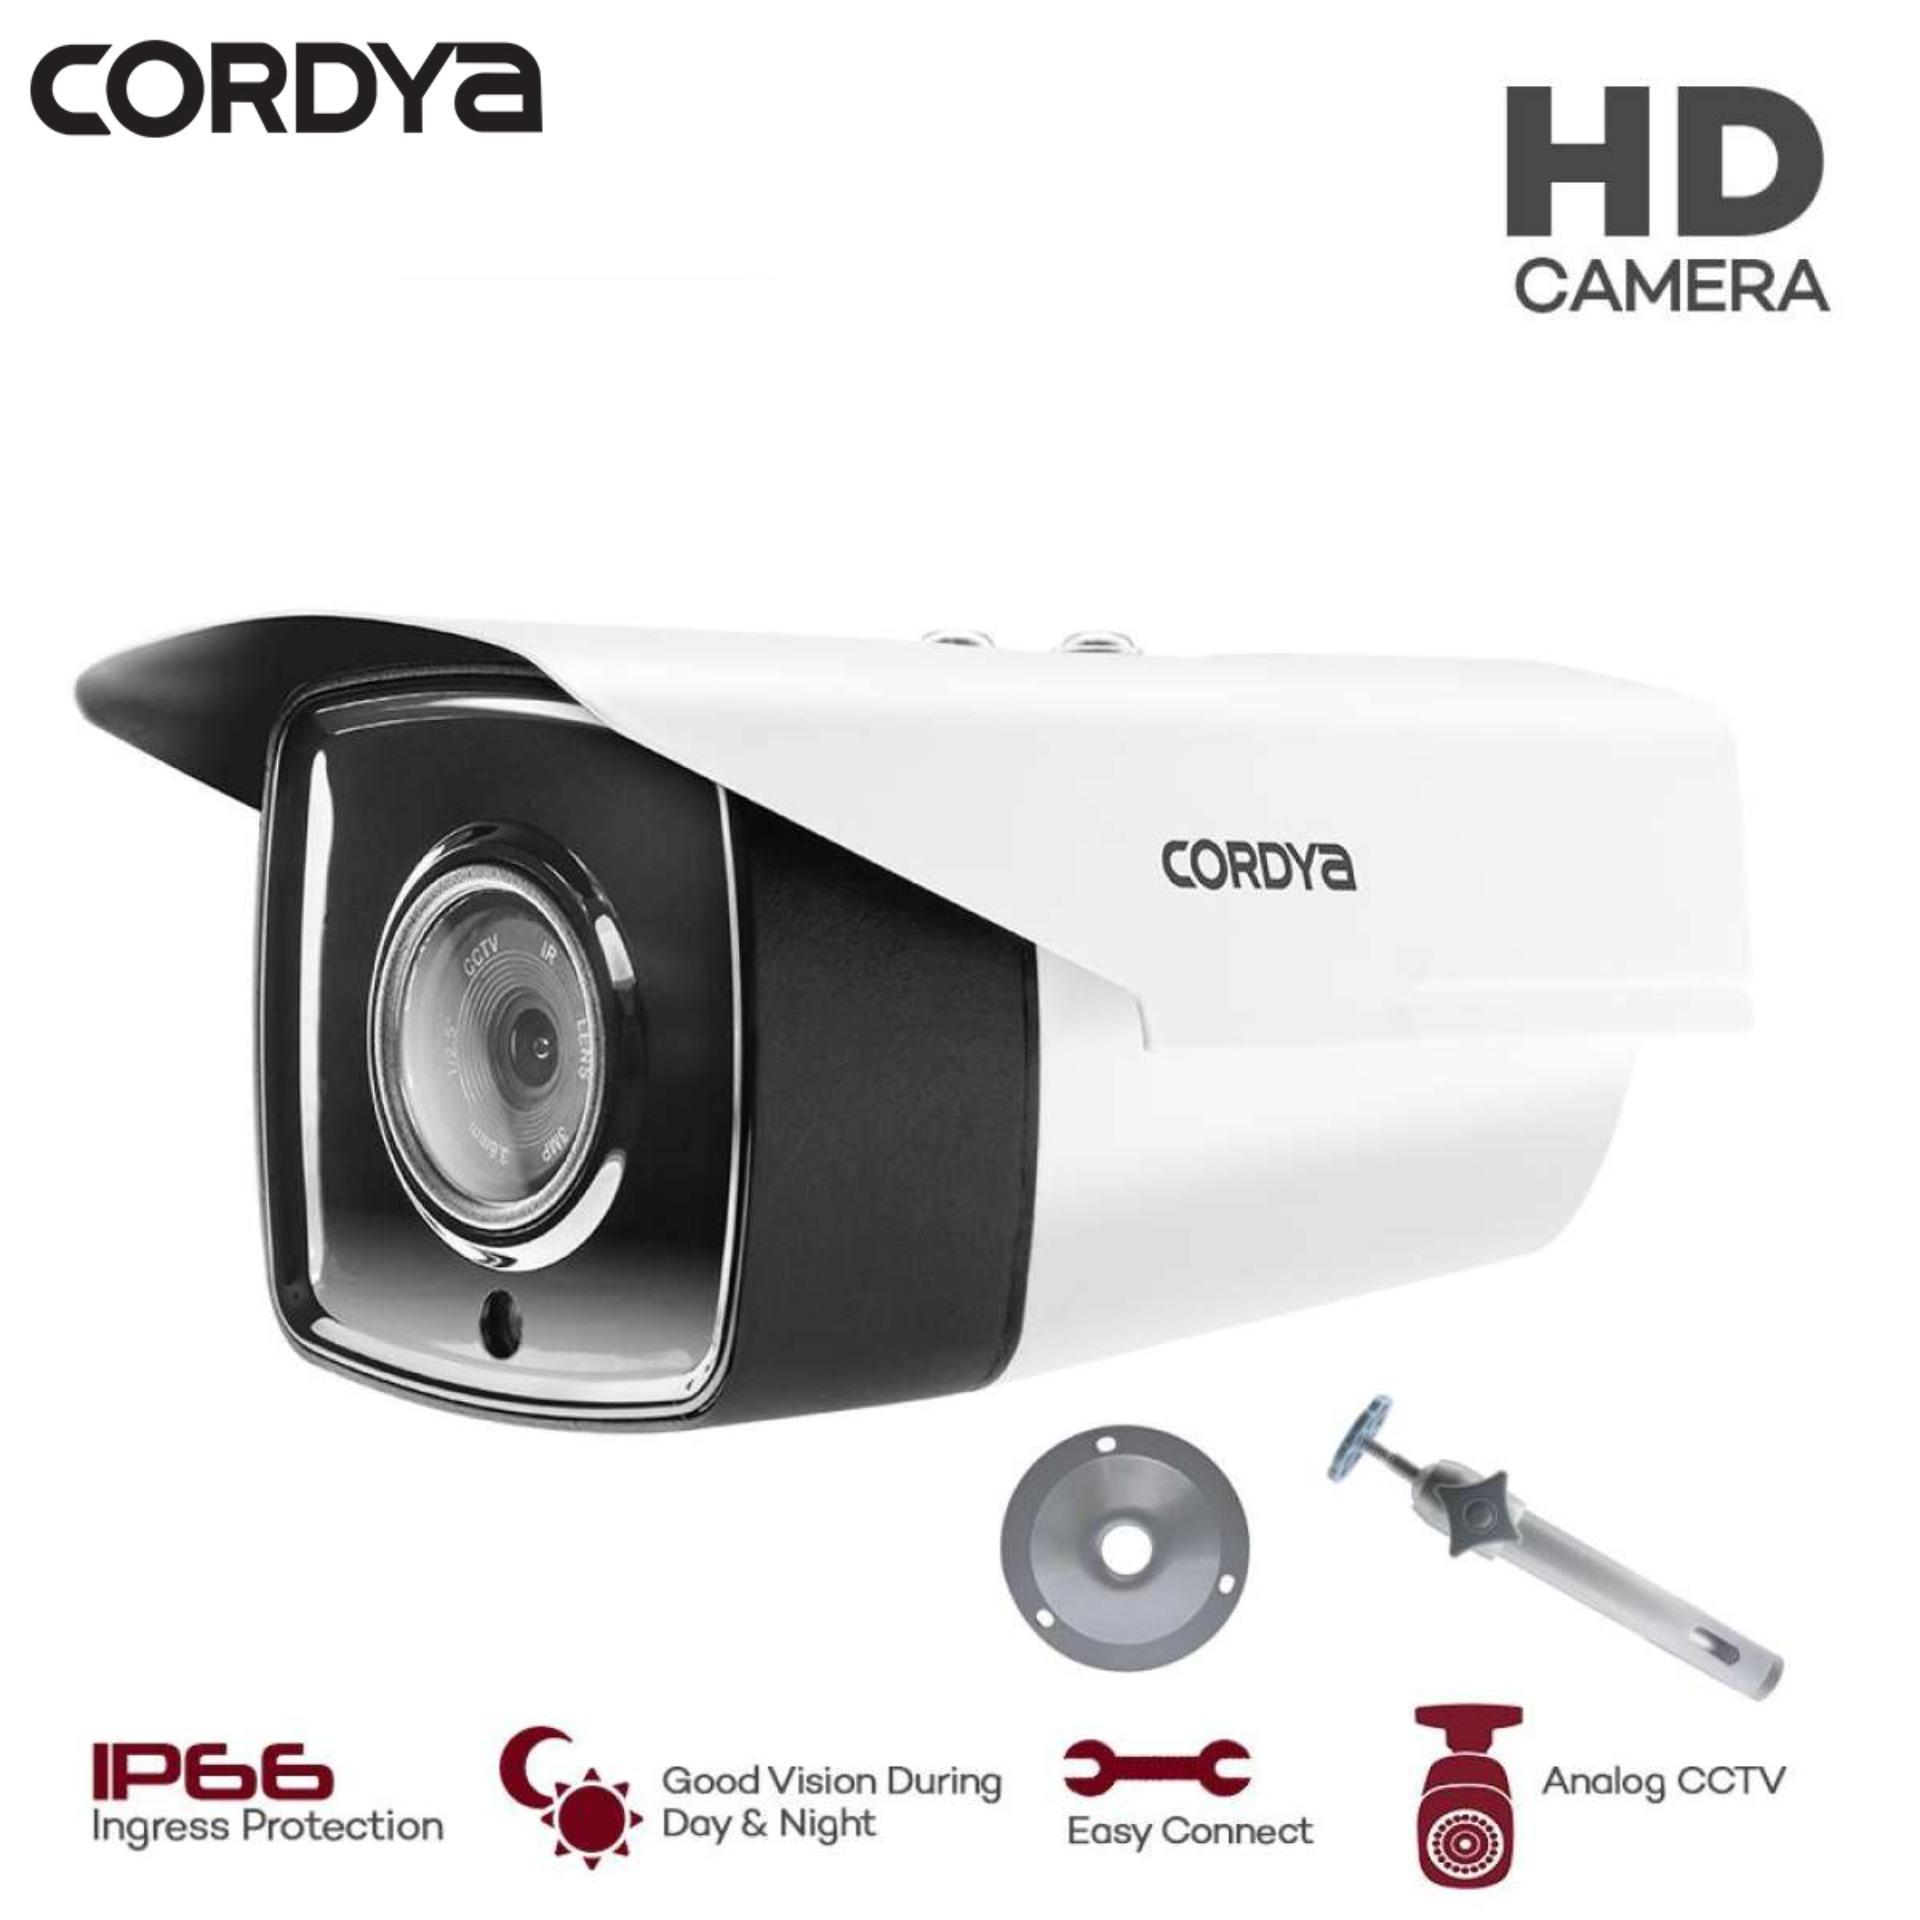 Cordya 965AHD AHD IP66 2 0MP 3 6MM Night Vision Analog CCTV 1PC Metal  Bullet Camera